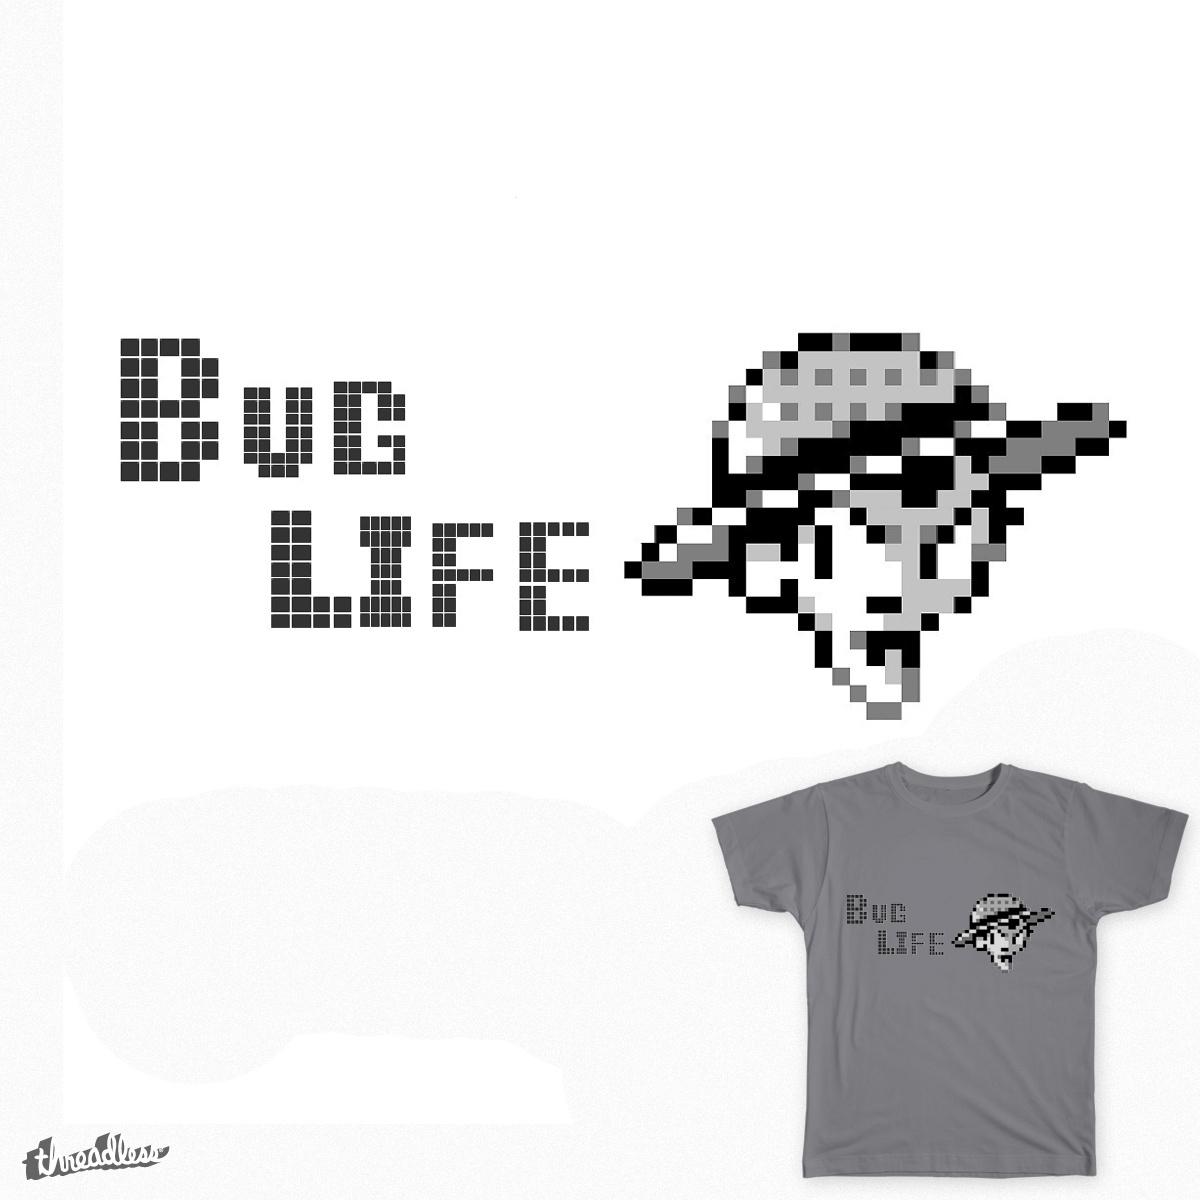 The Bug Life. by HItItPapaBear on Threadless